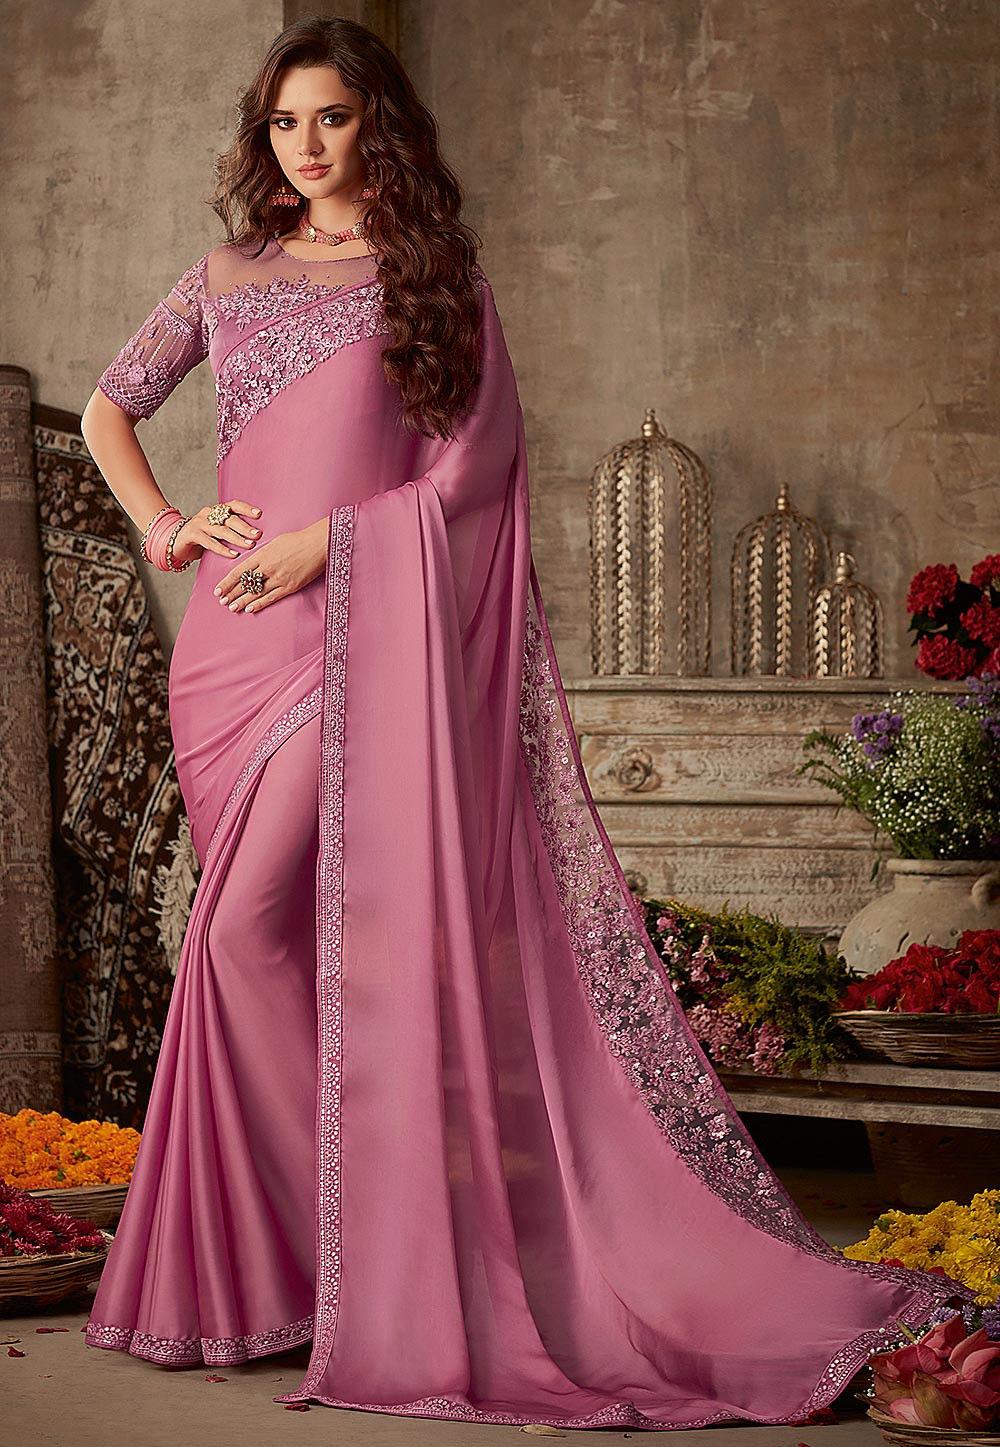 Embroidered Border Satin Saree in Pink : SFVA1148